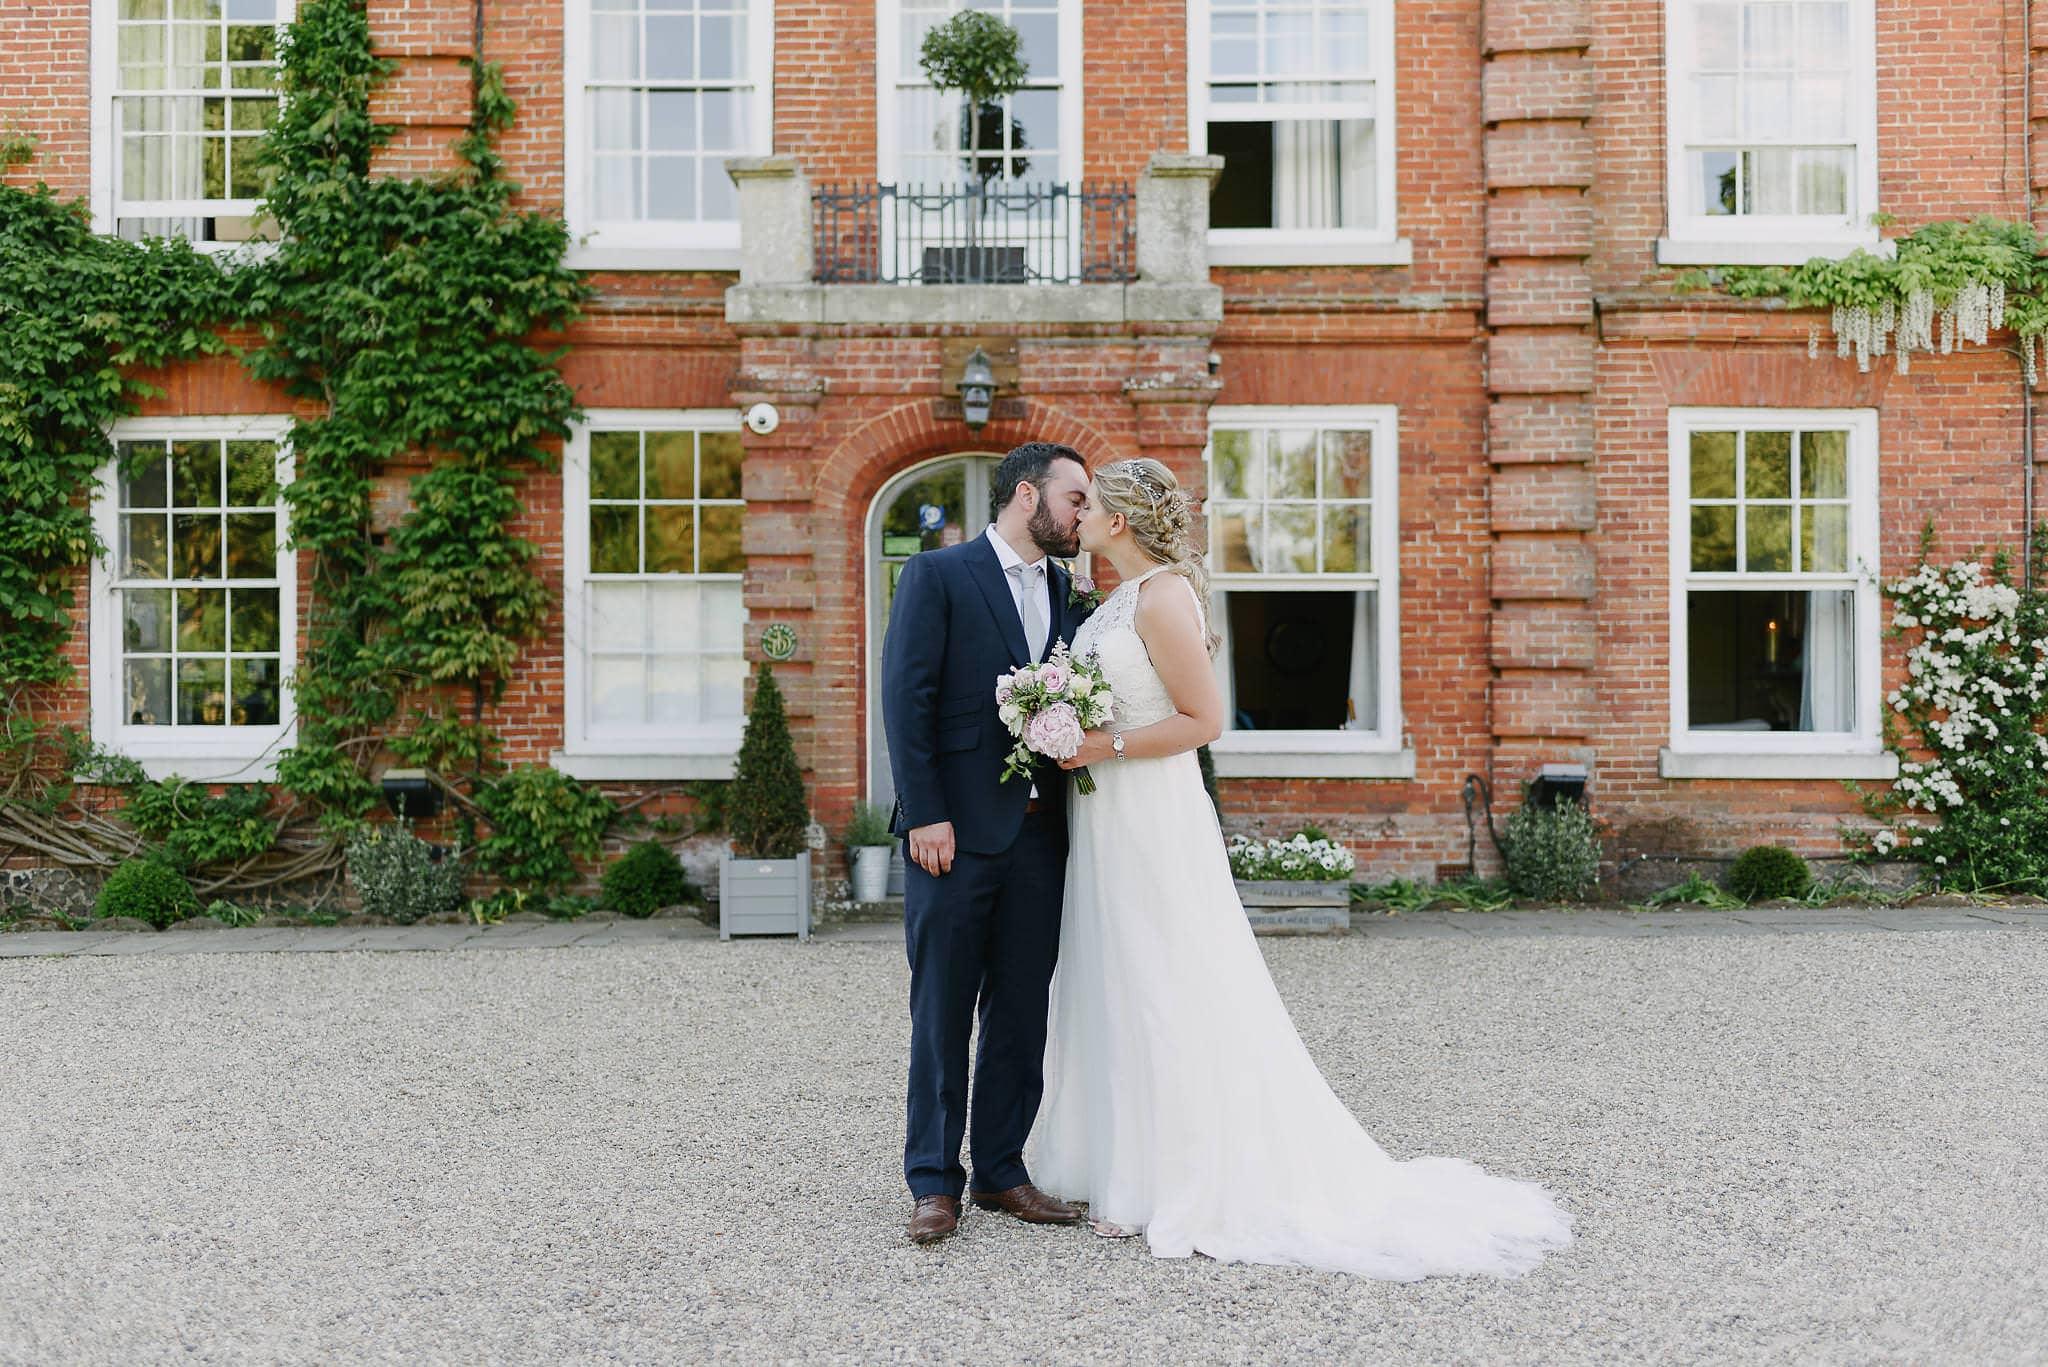 Bex & Neil - Norfolk Mead Wedding 24